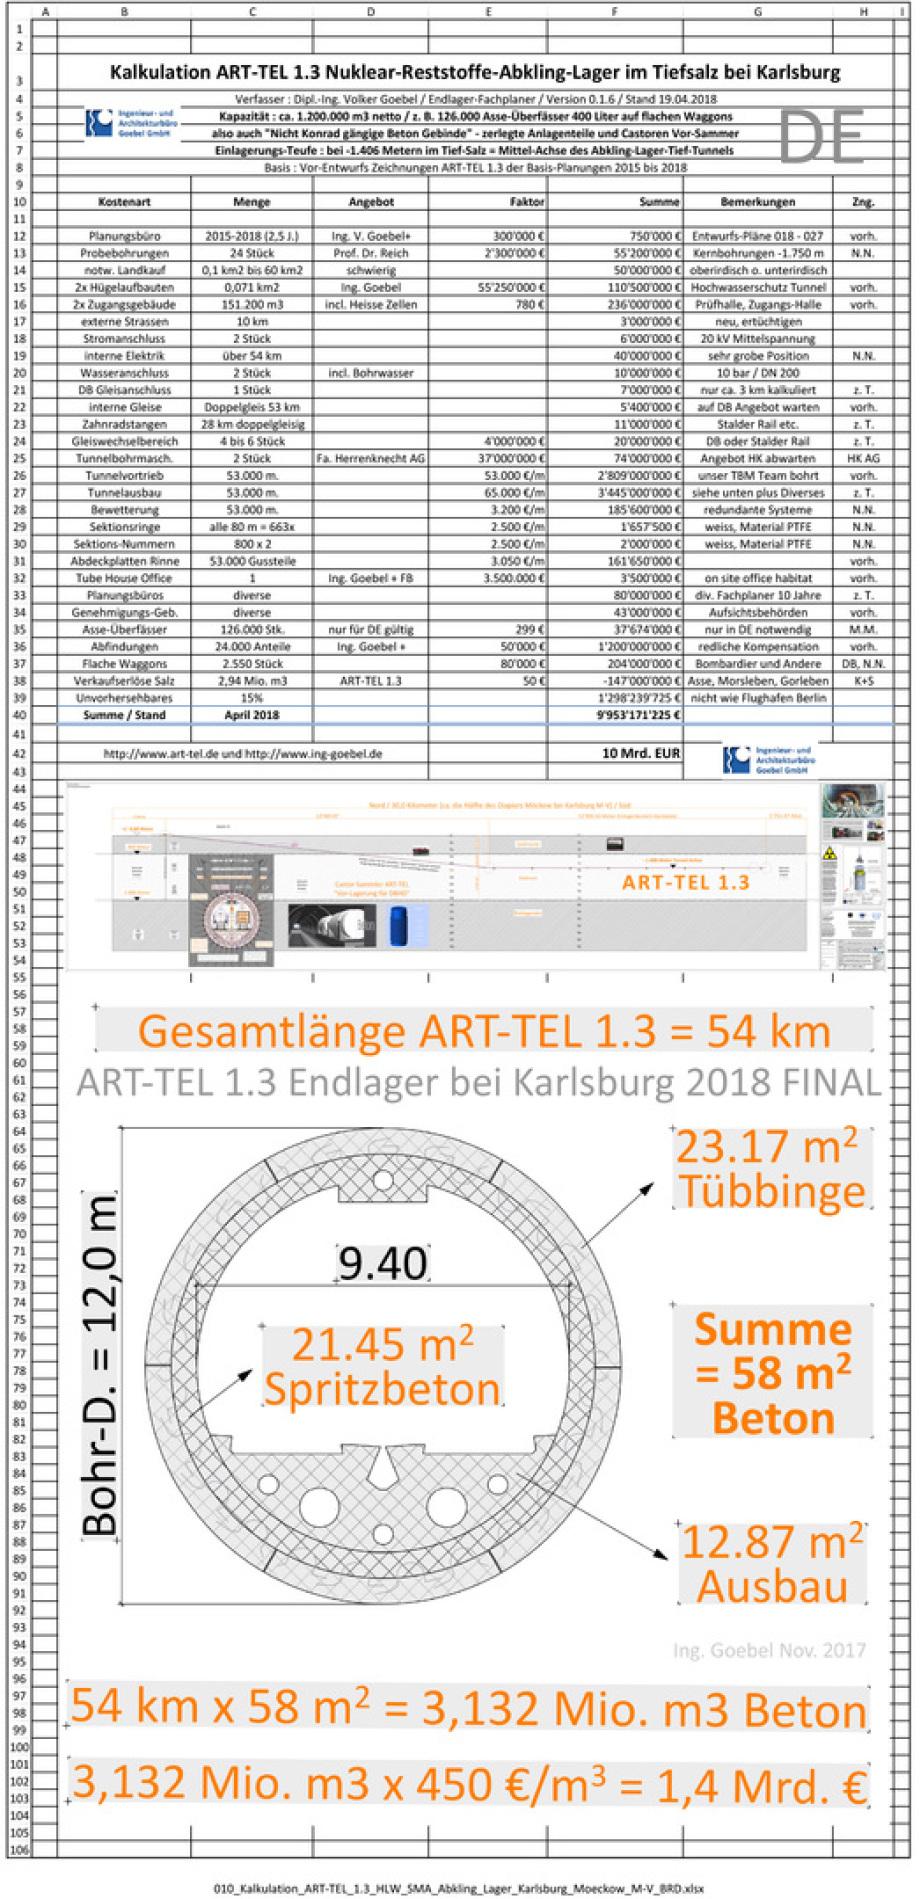 010_Kalkulation_ART-TEL_1.3_HLW_SMA_Abkling_Lager_Karlsburg_Moeckow_M-V_BRD für BGE GmbH und BFE Berlin